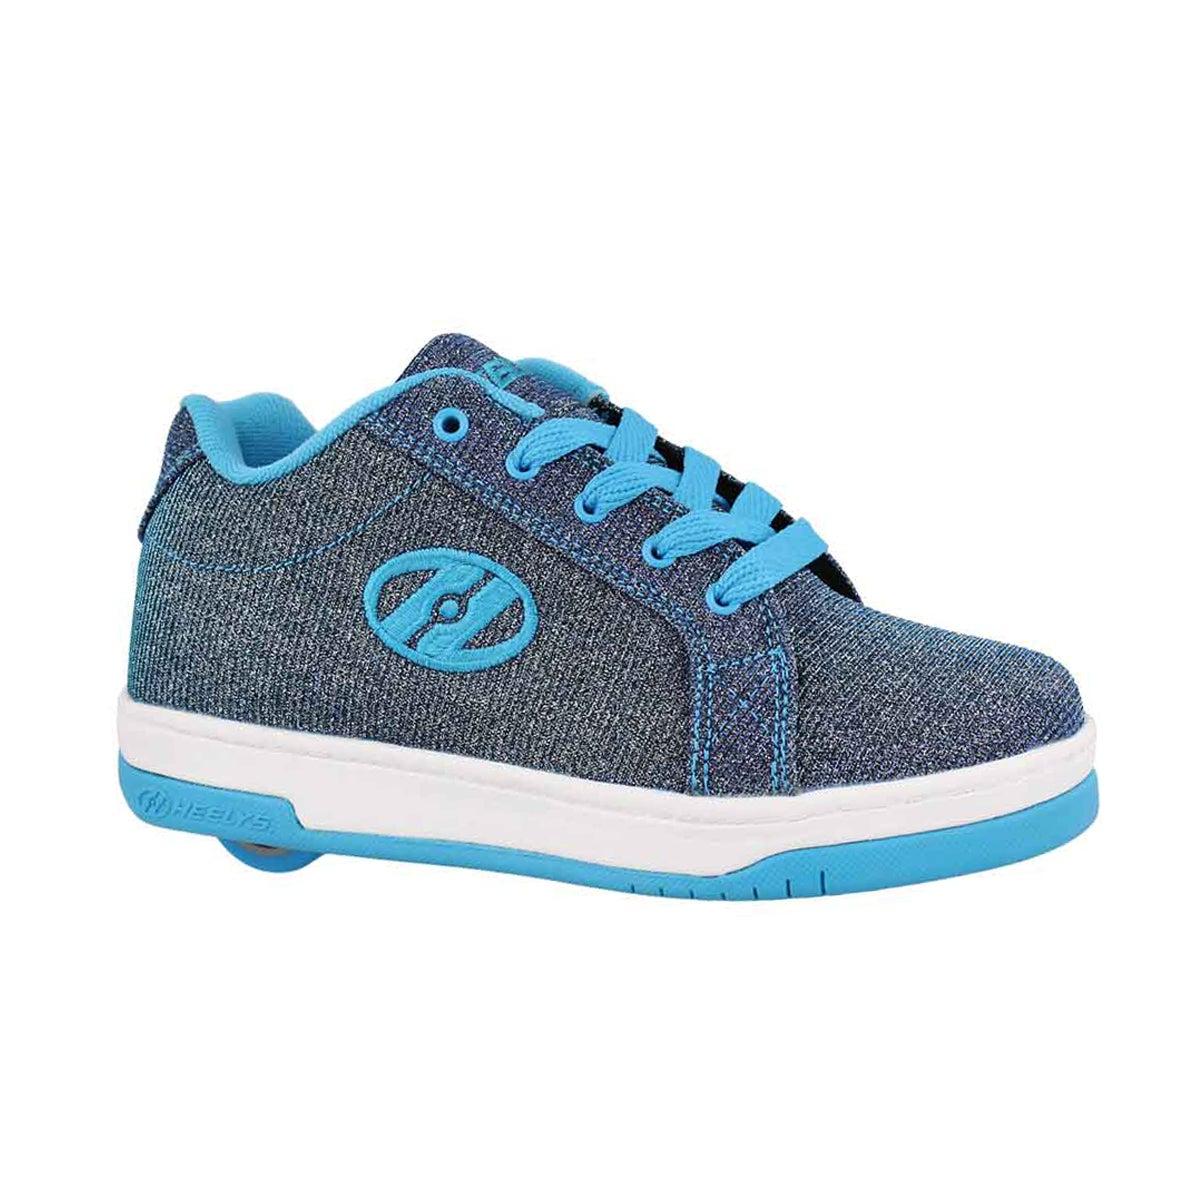 Girls' SPLIT pewter blue skate sneakers